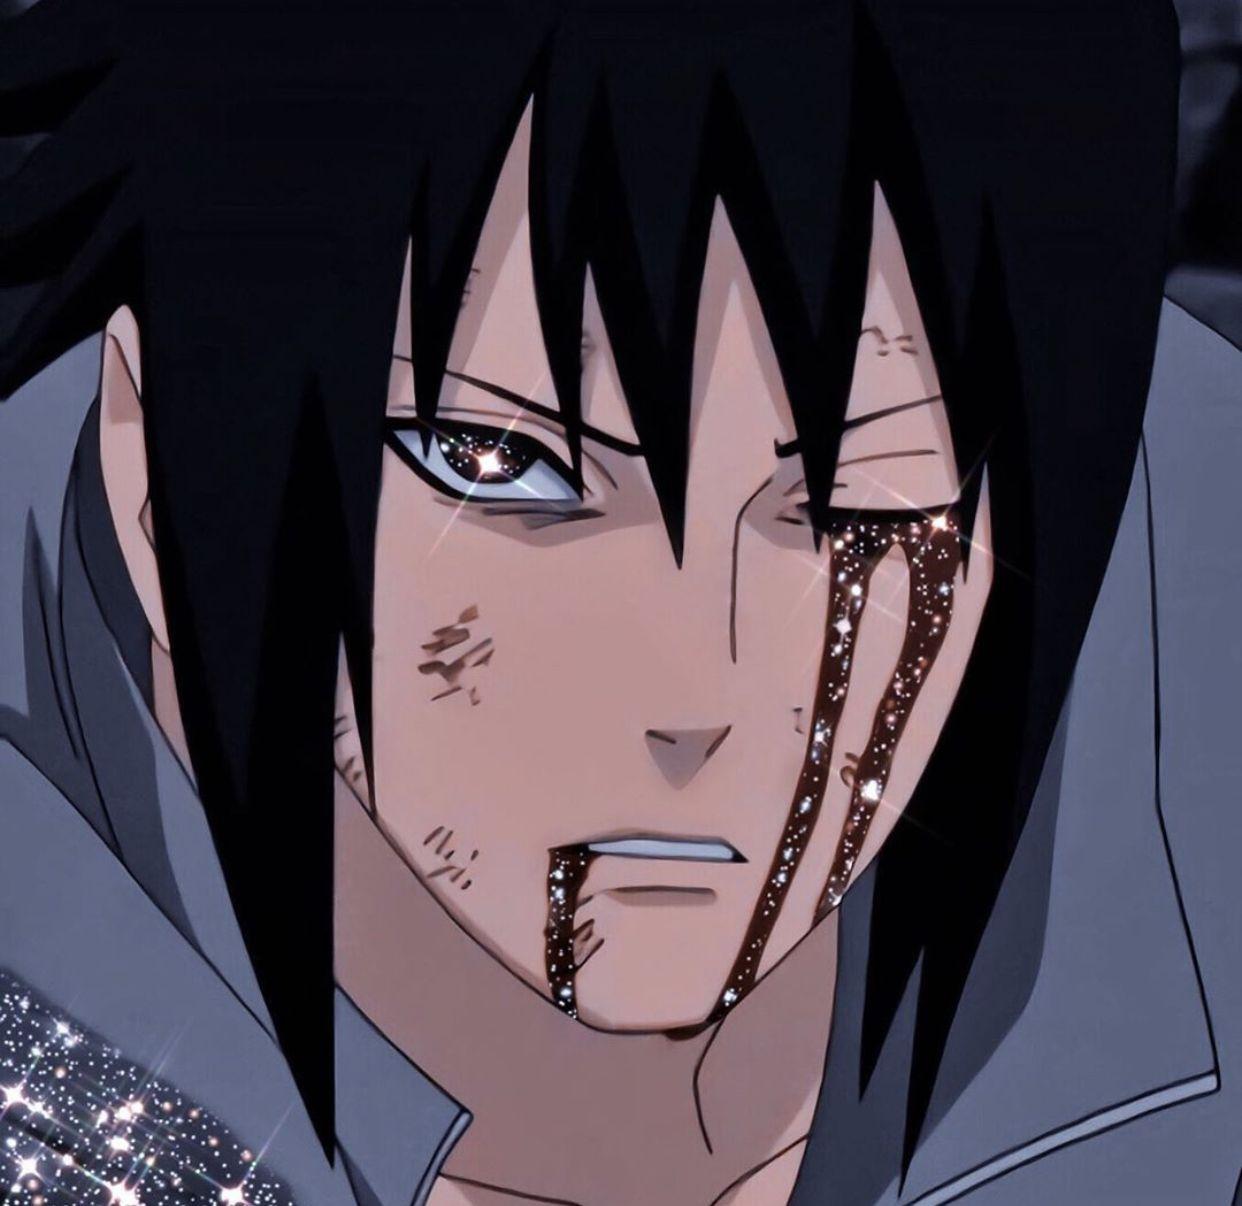 ꉂ⸝⸝.♡̸こそ𝐈𝐂𝐎𝐍𝐒 𝐒𝐀𝐒𝐔𝐊𝐄🥢𓂃⋆ em 2020 Arte com glitter, Anime